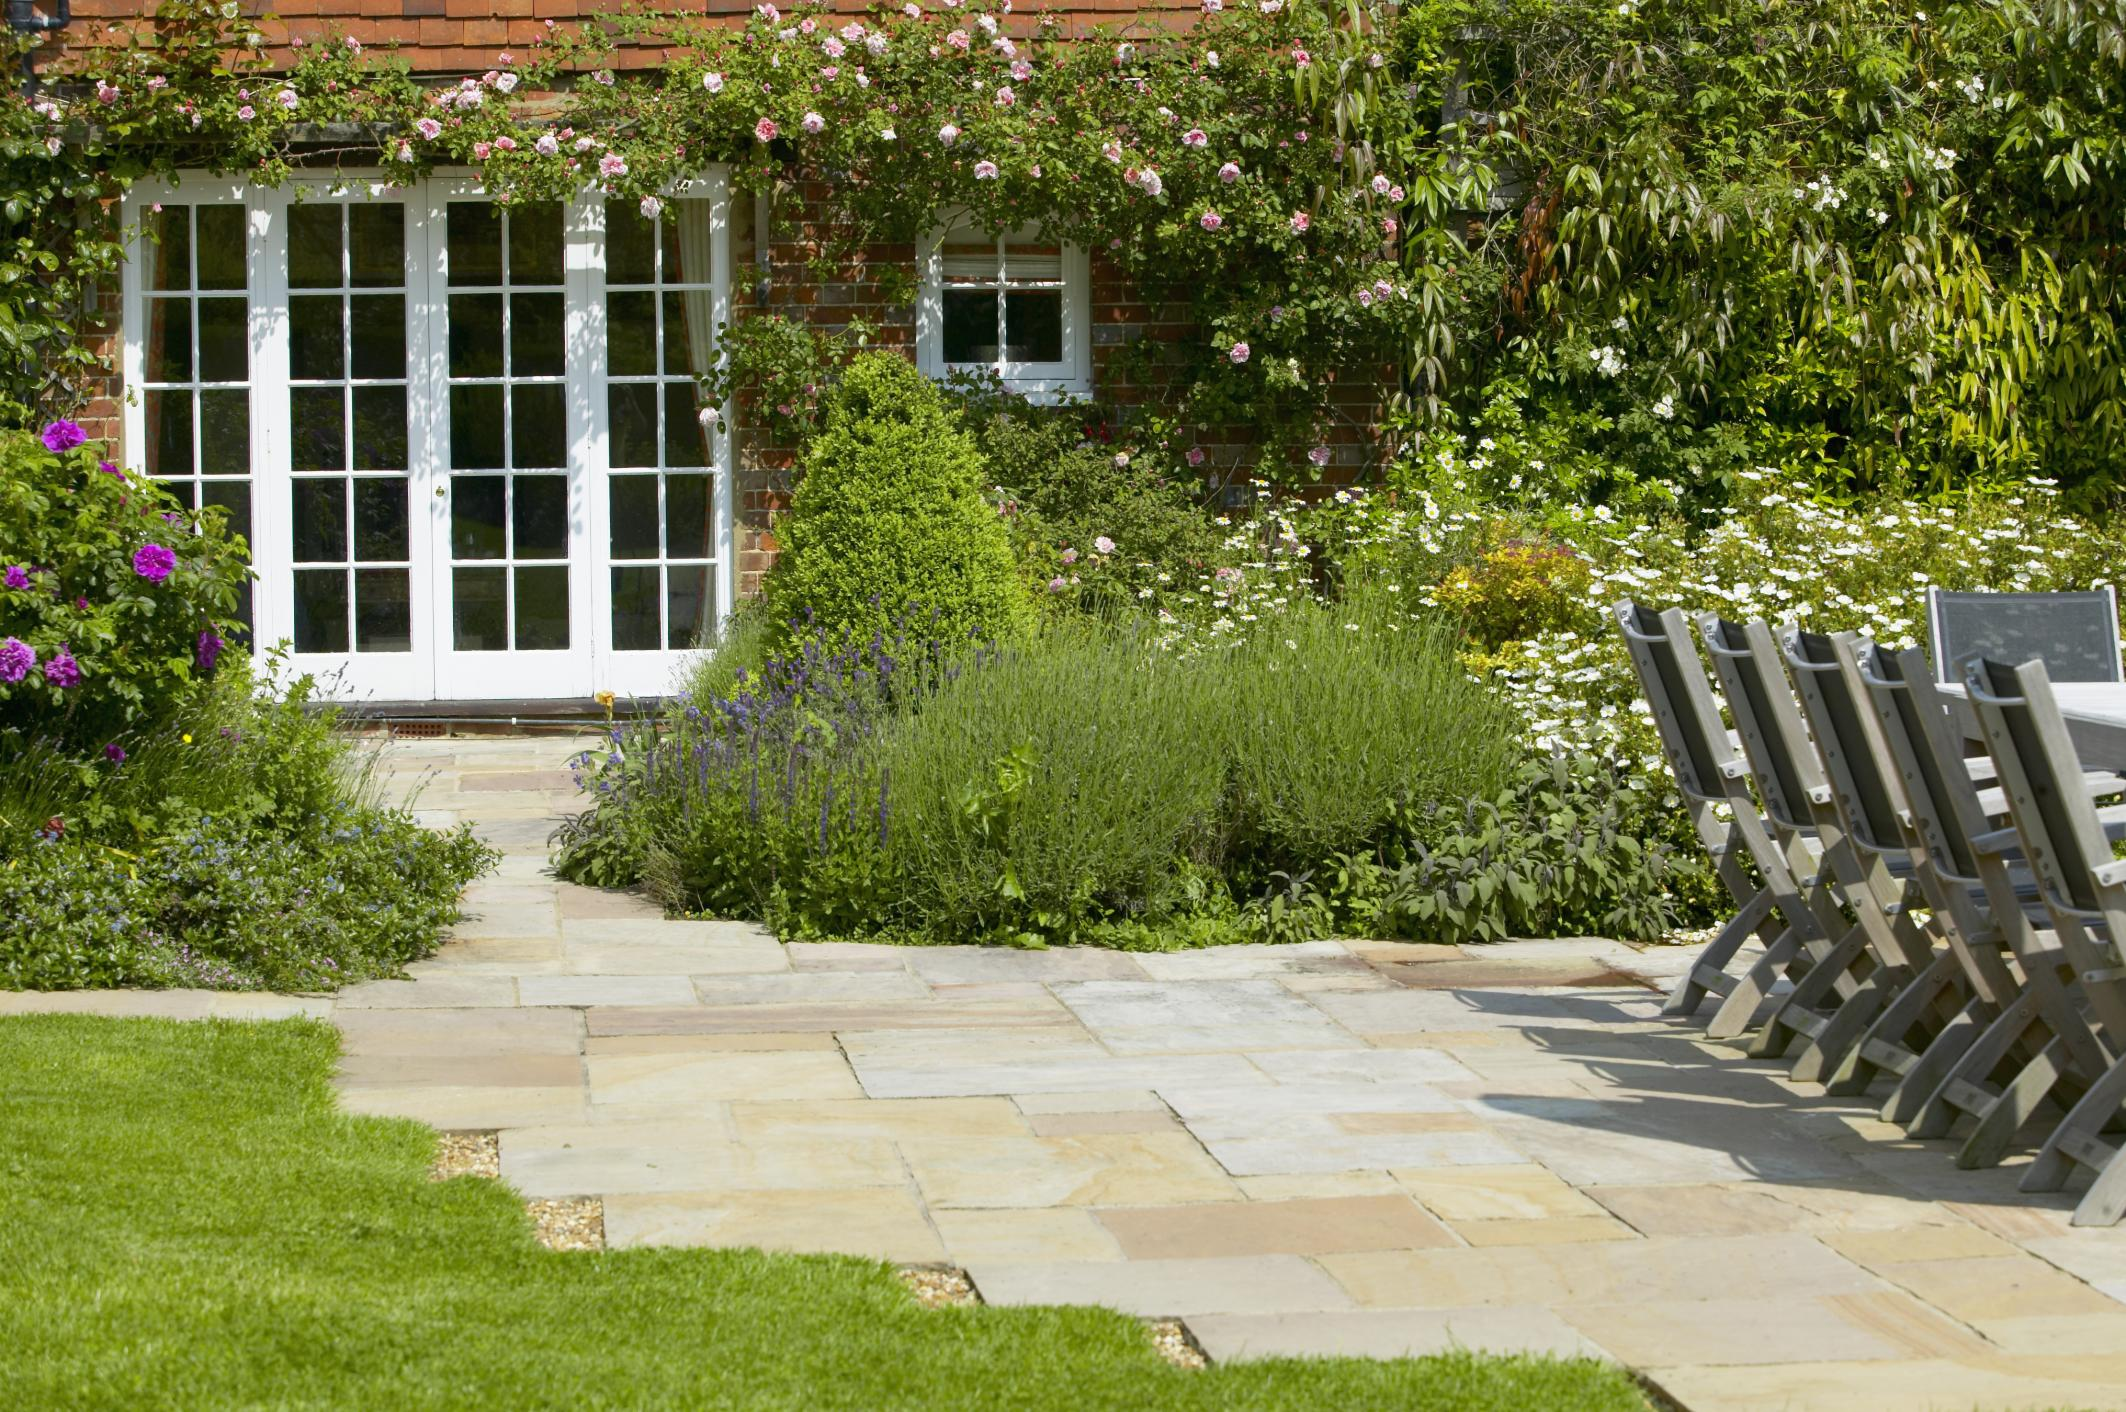 17 easy landscaping ideas for Channel 4 garden design ideas